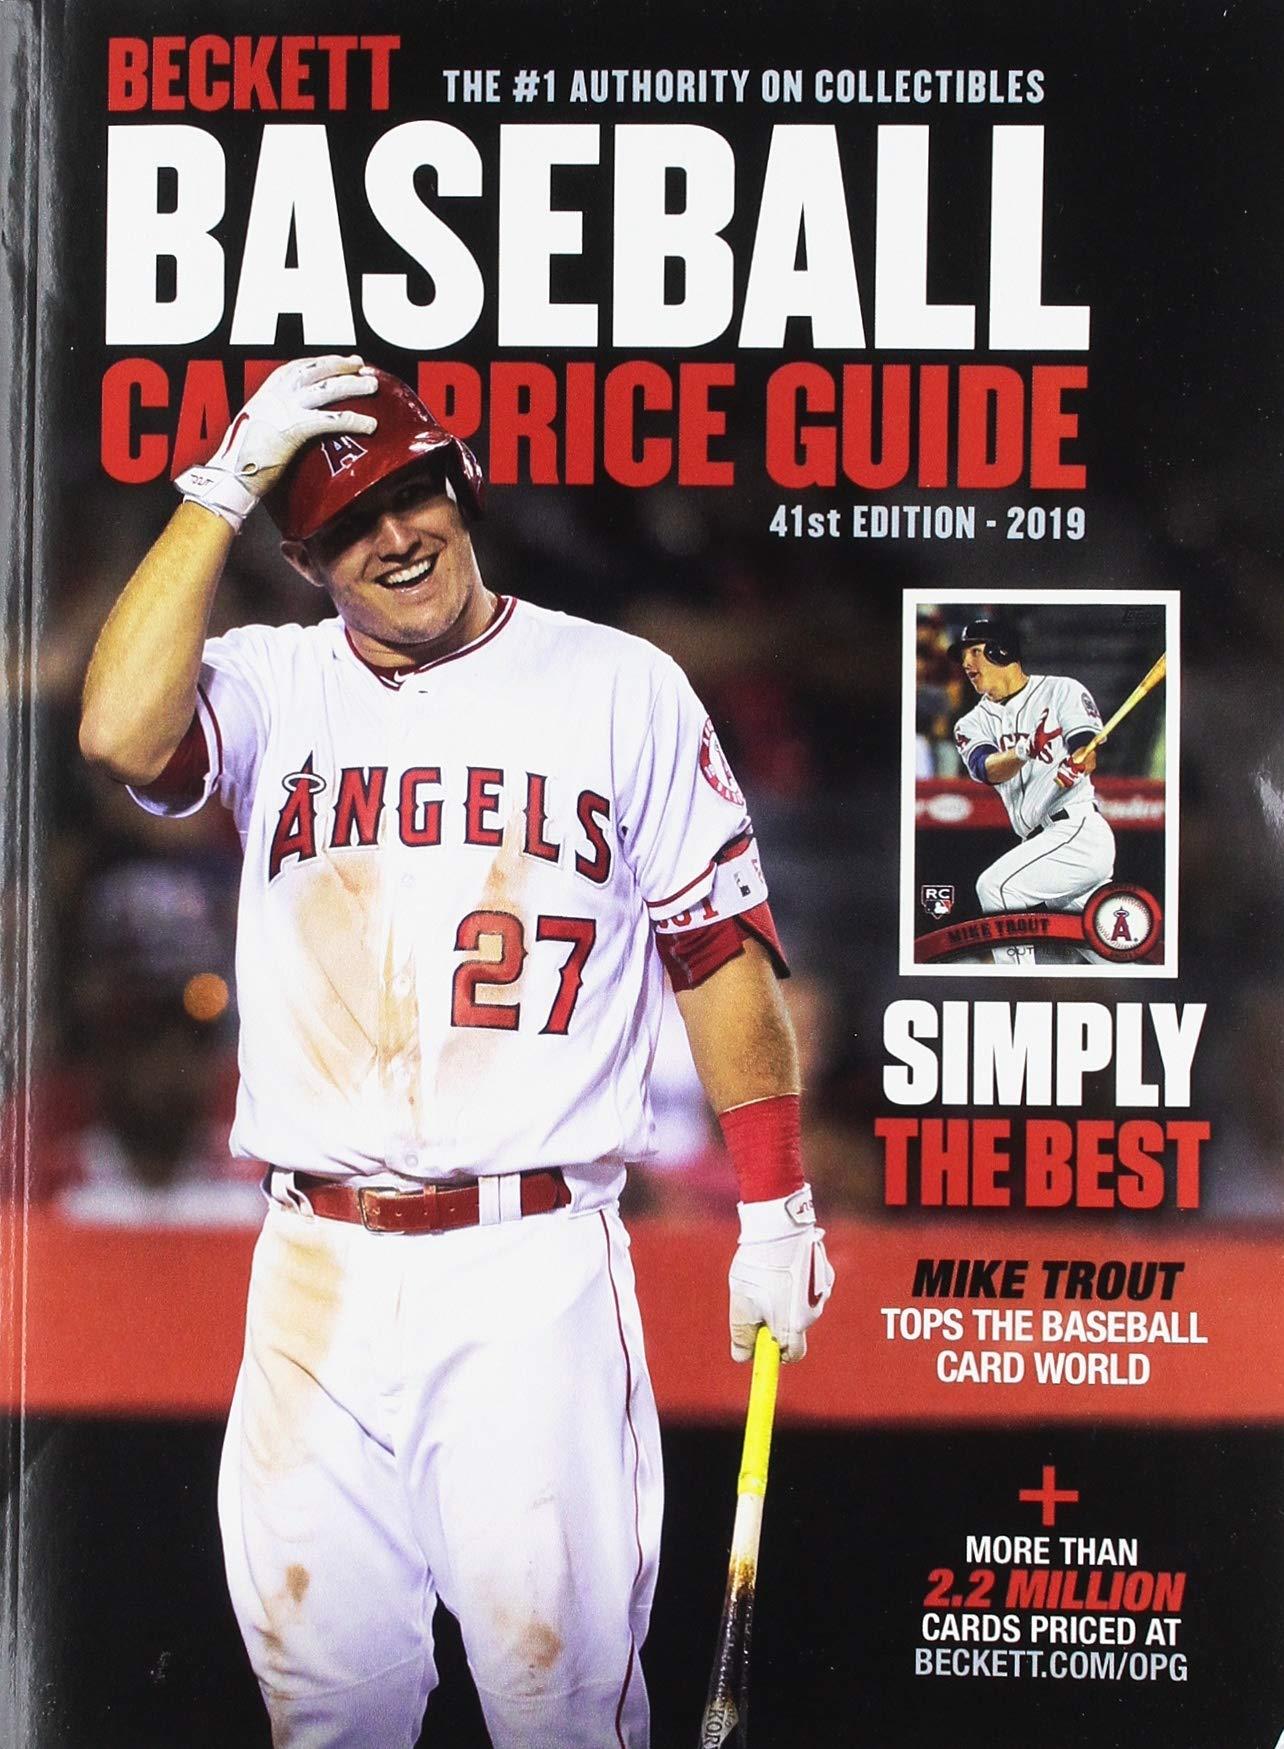 Beckett Baseball Card Price Guide 2019 Beckett Media